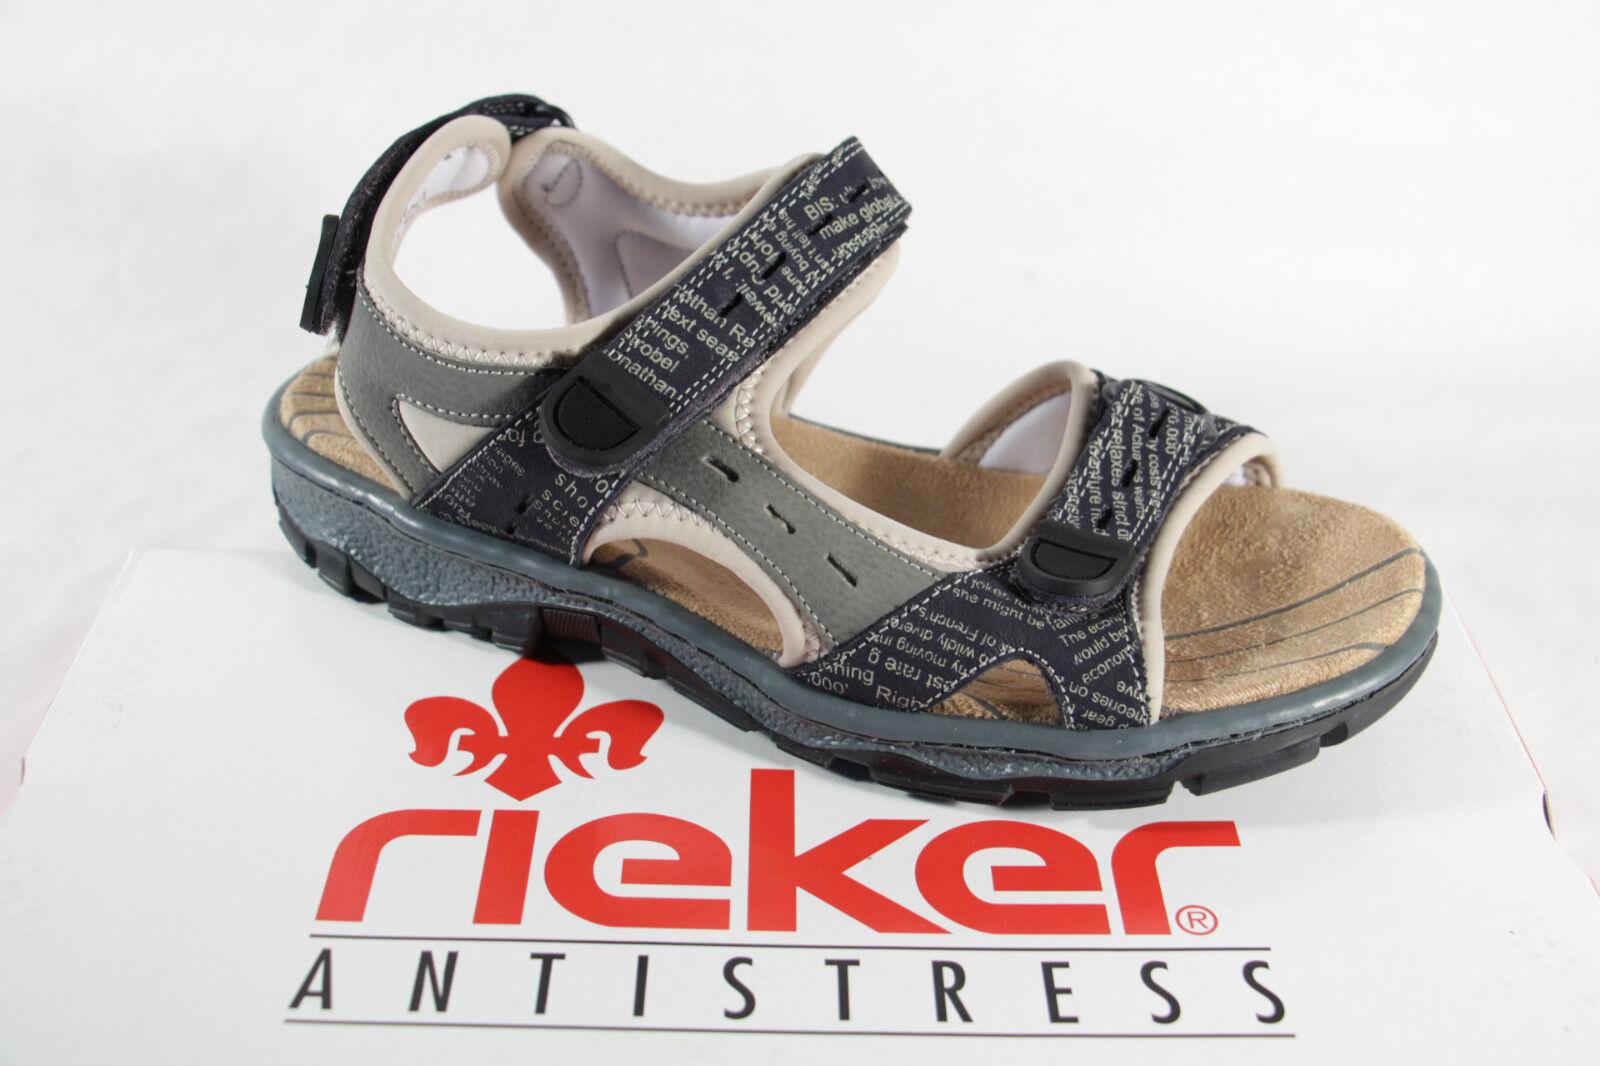 Rieker Damen grau Sandalen Sandale Sandaletten grau Damen Klettverschluß 68872 NEU 9c21f2